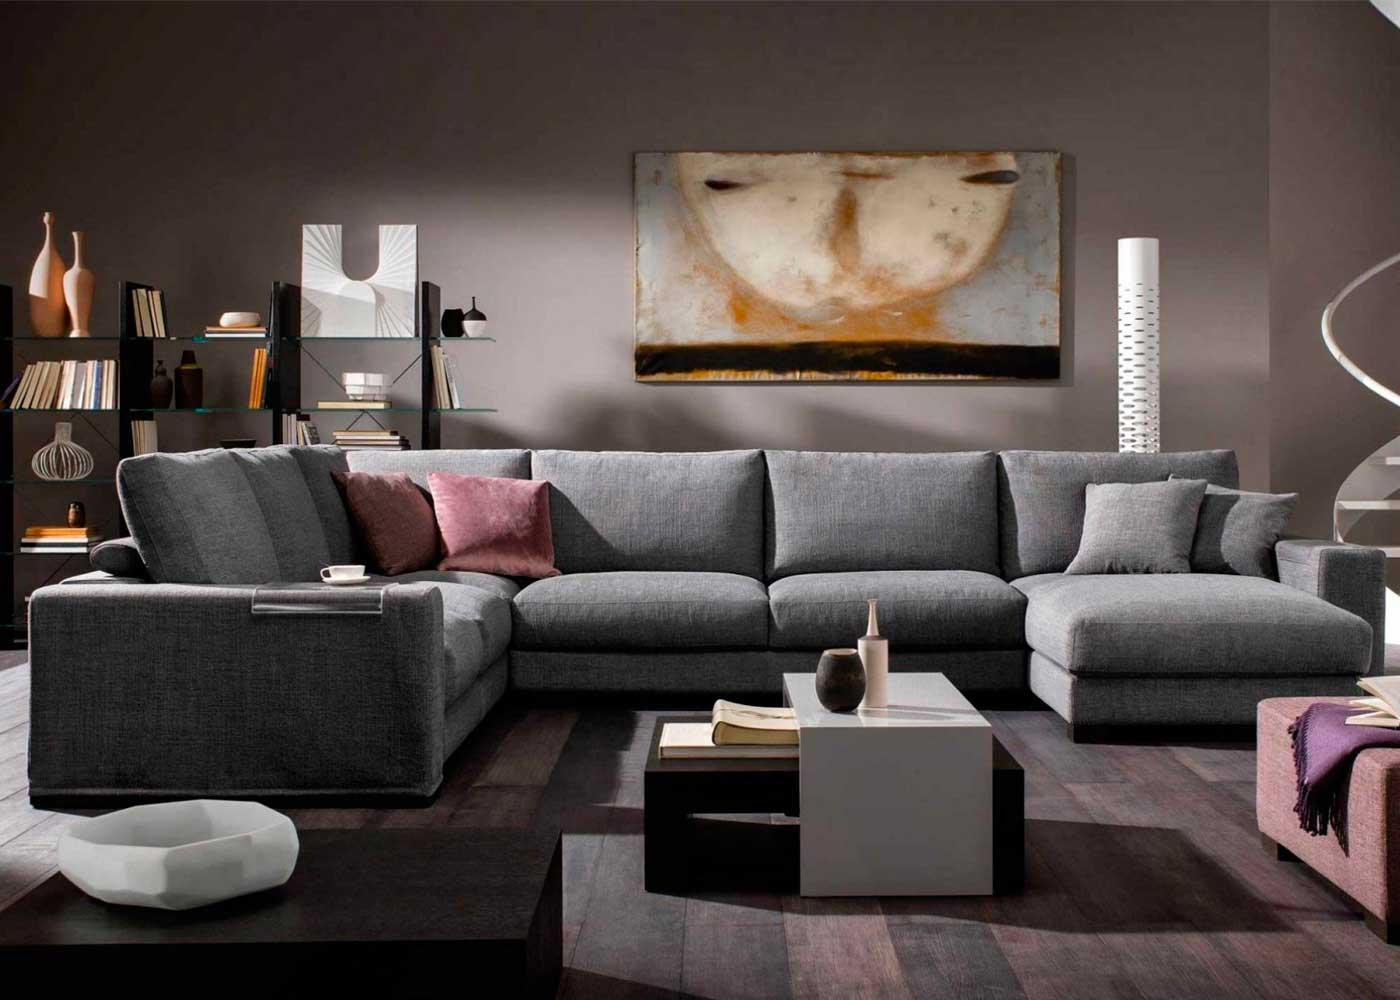 furniture sofa set online wood frame natuzzi domino corner - midfurn superstore